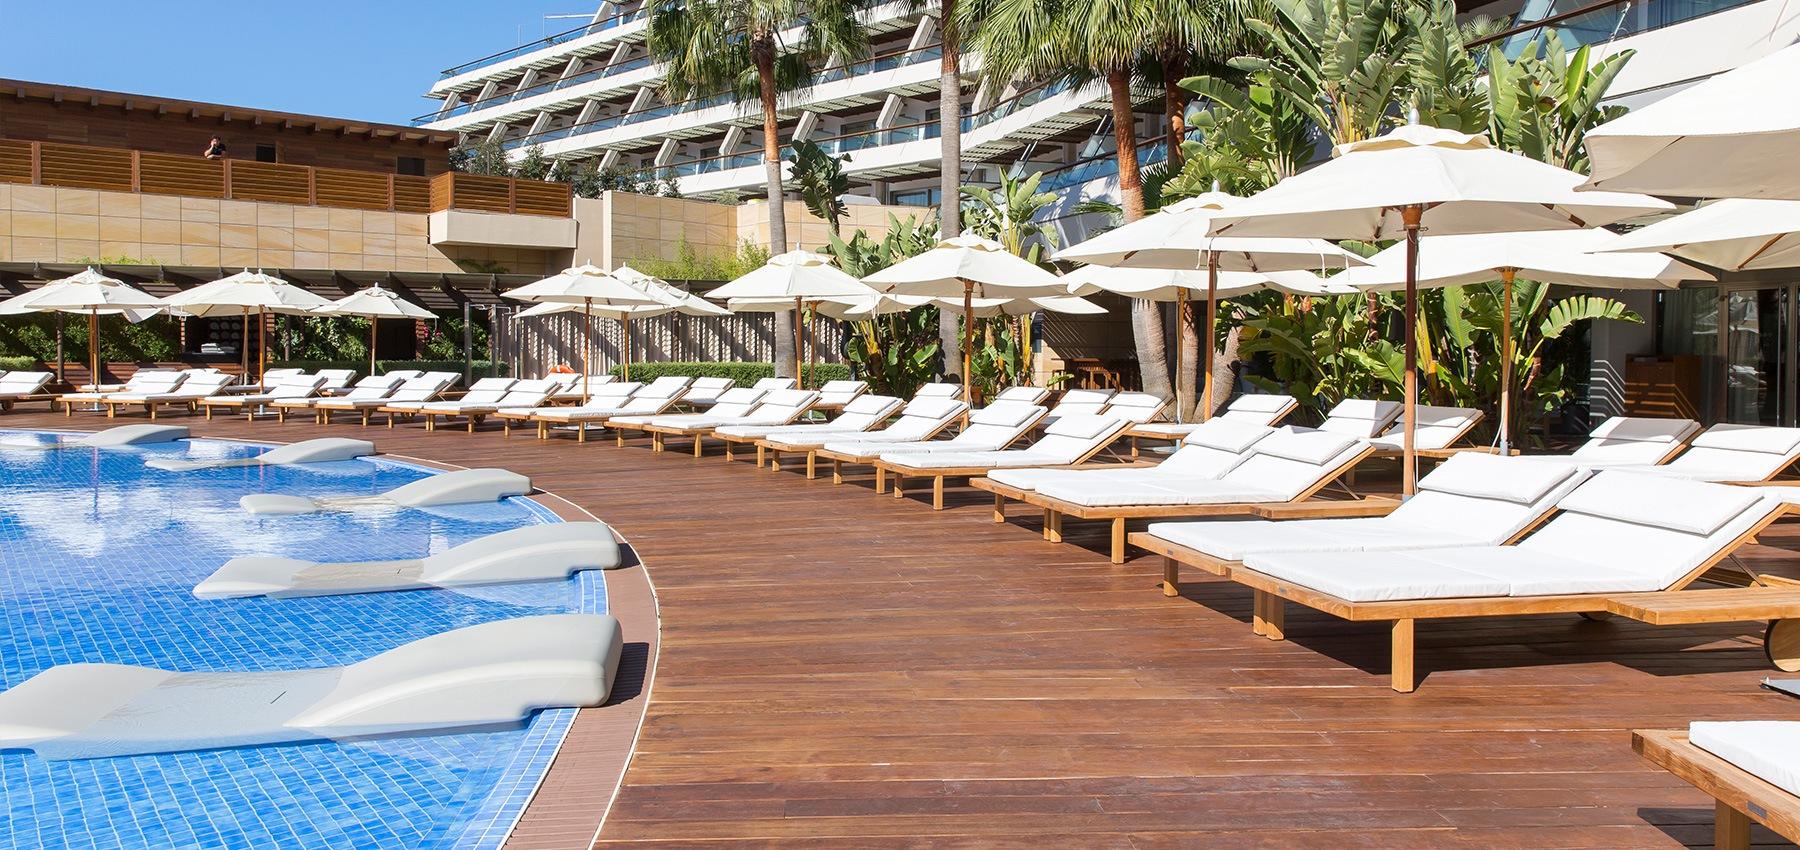 Poolside Ibiza Gran Hotel